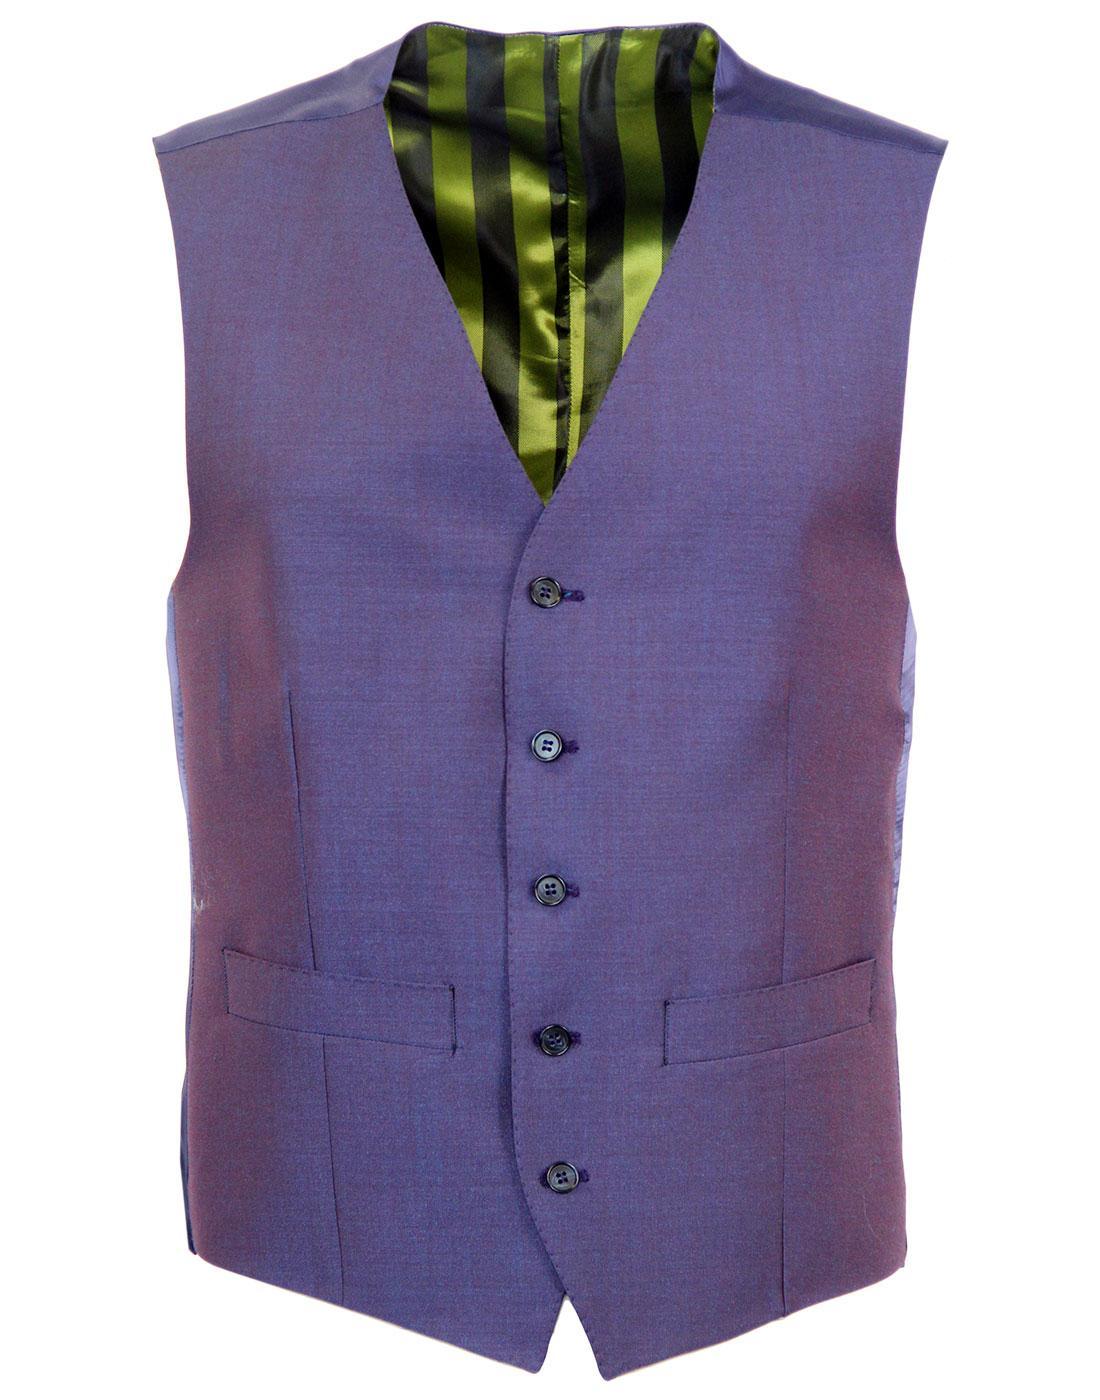 MADCAP ENGLAND 60s Mod Tonic V Neckline Waistcoat